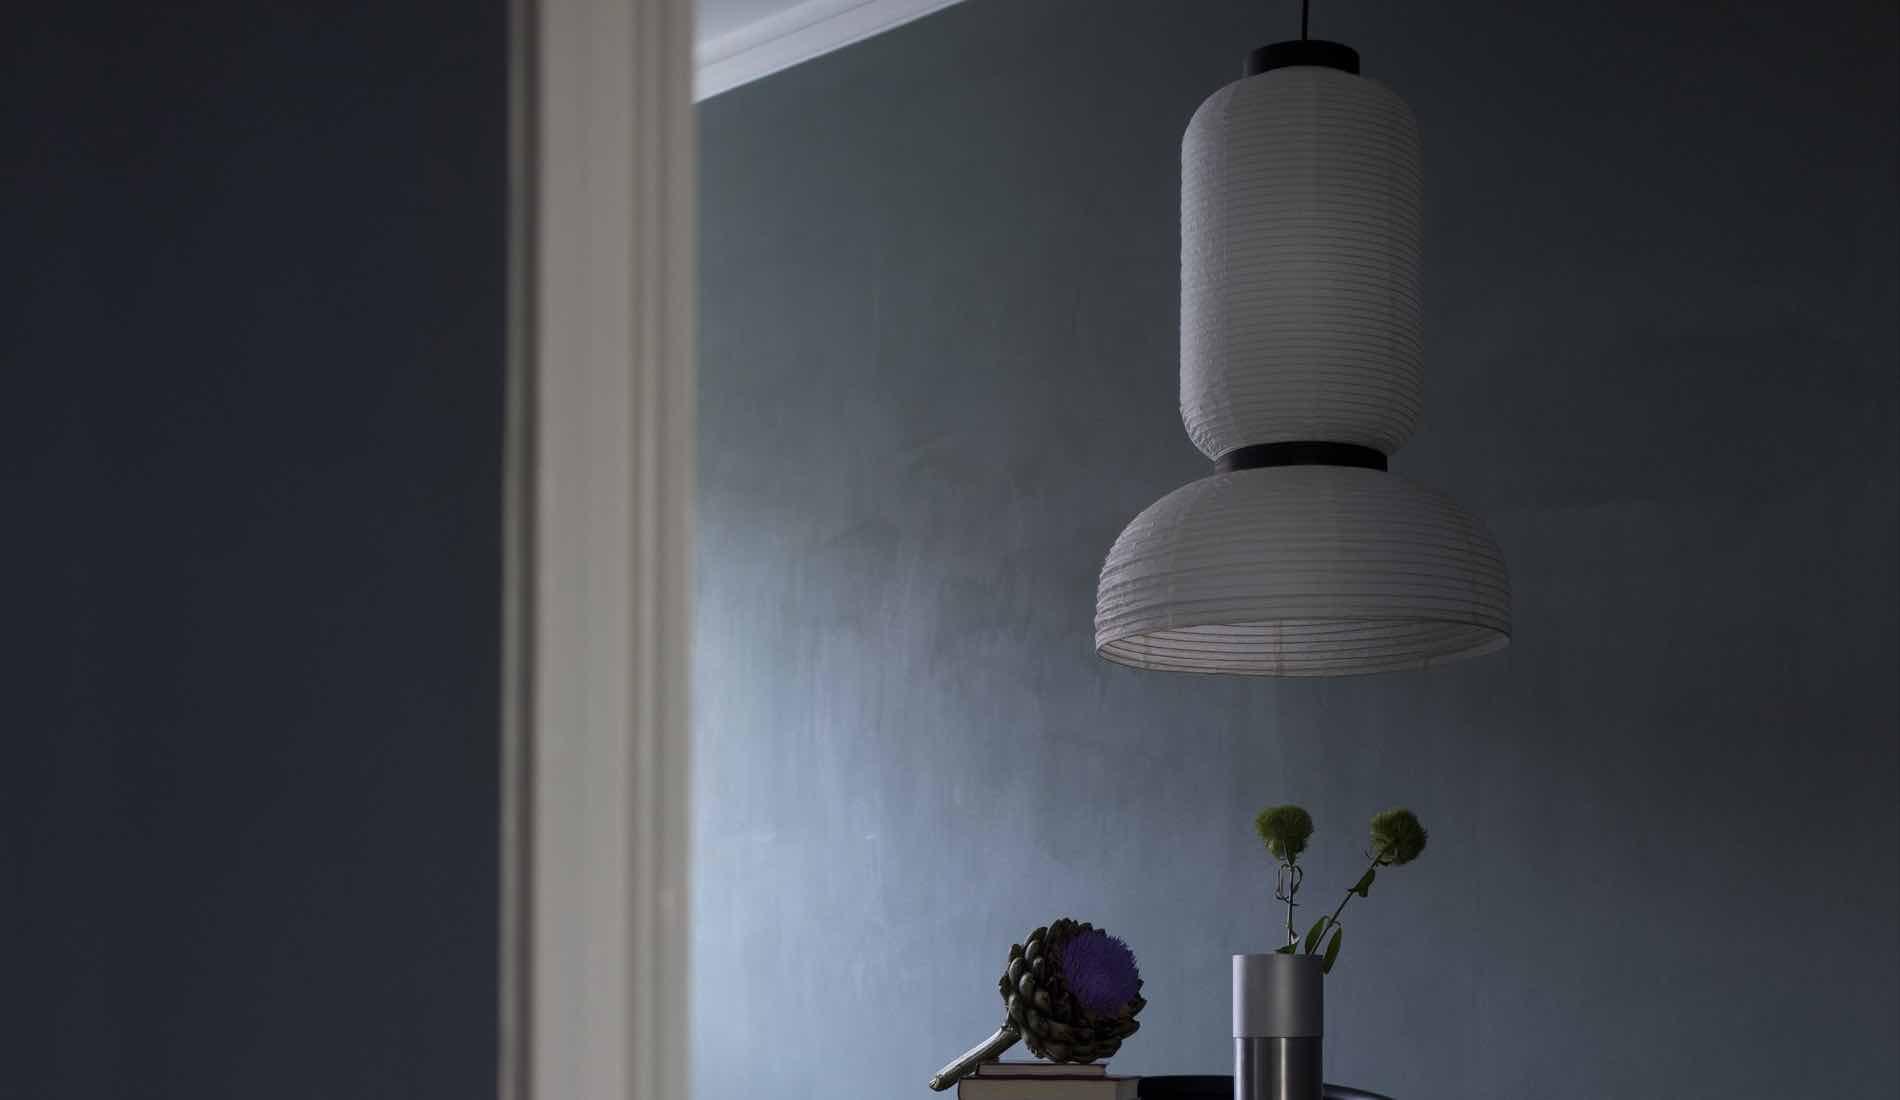 formakami lampe von tradition designs2love. Black Bedroom Furniture Sets. Home Design Ideas